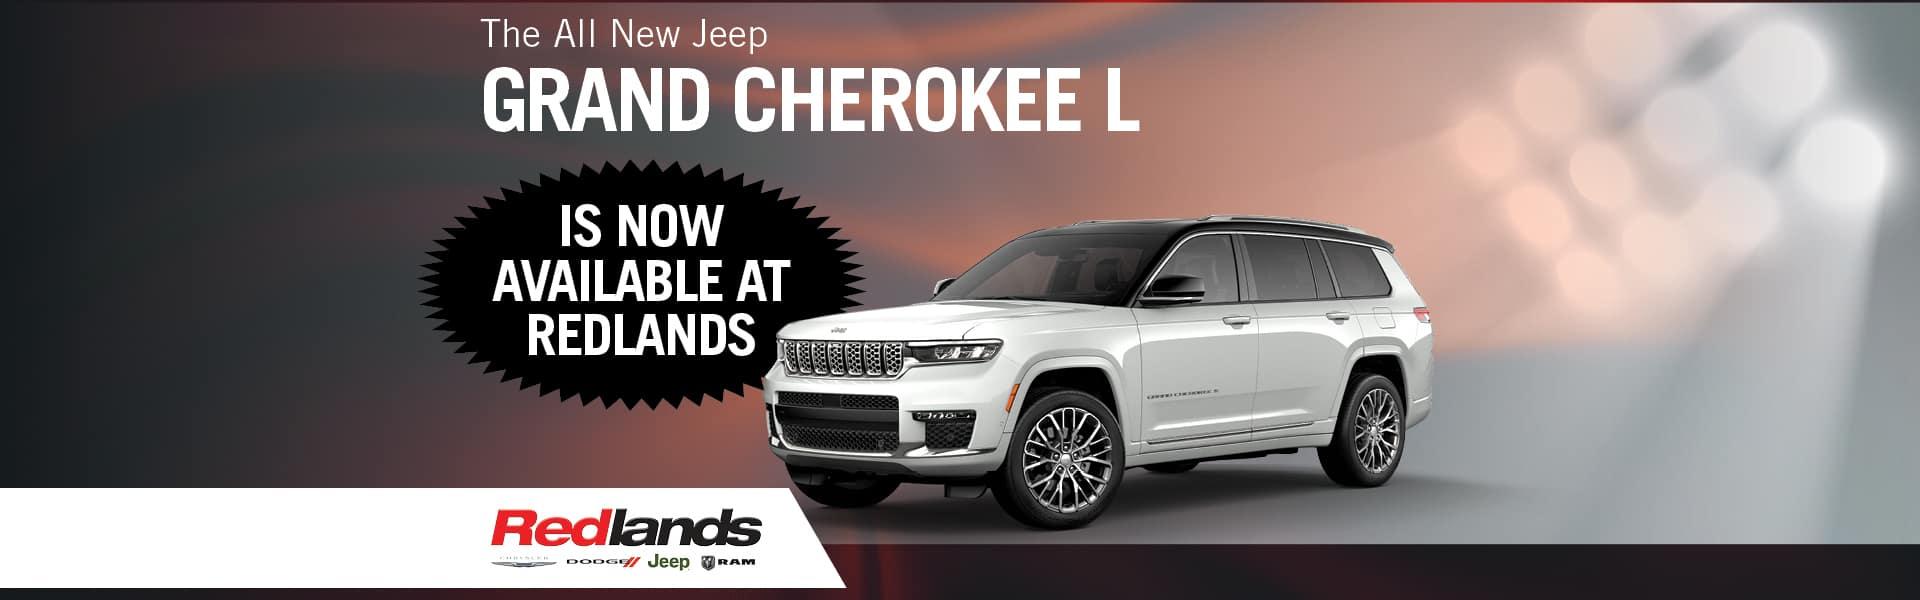 All New Jeep Grand Cherokee | Redlands CDJR